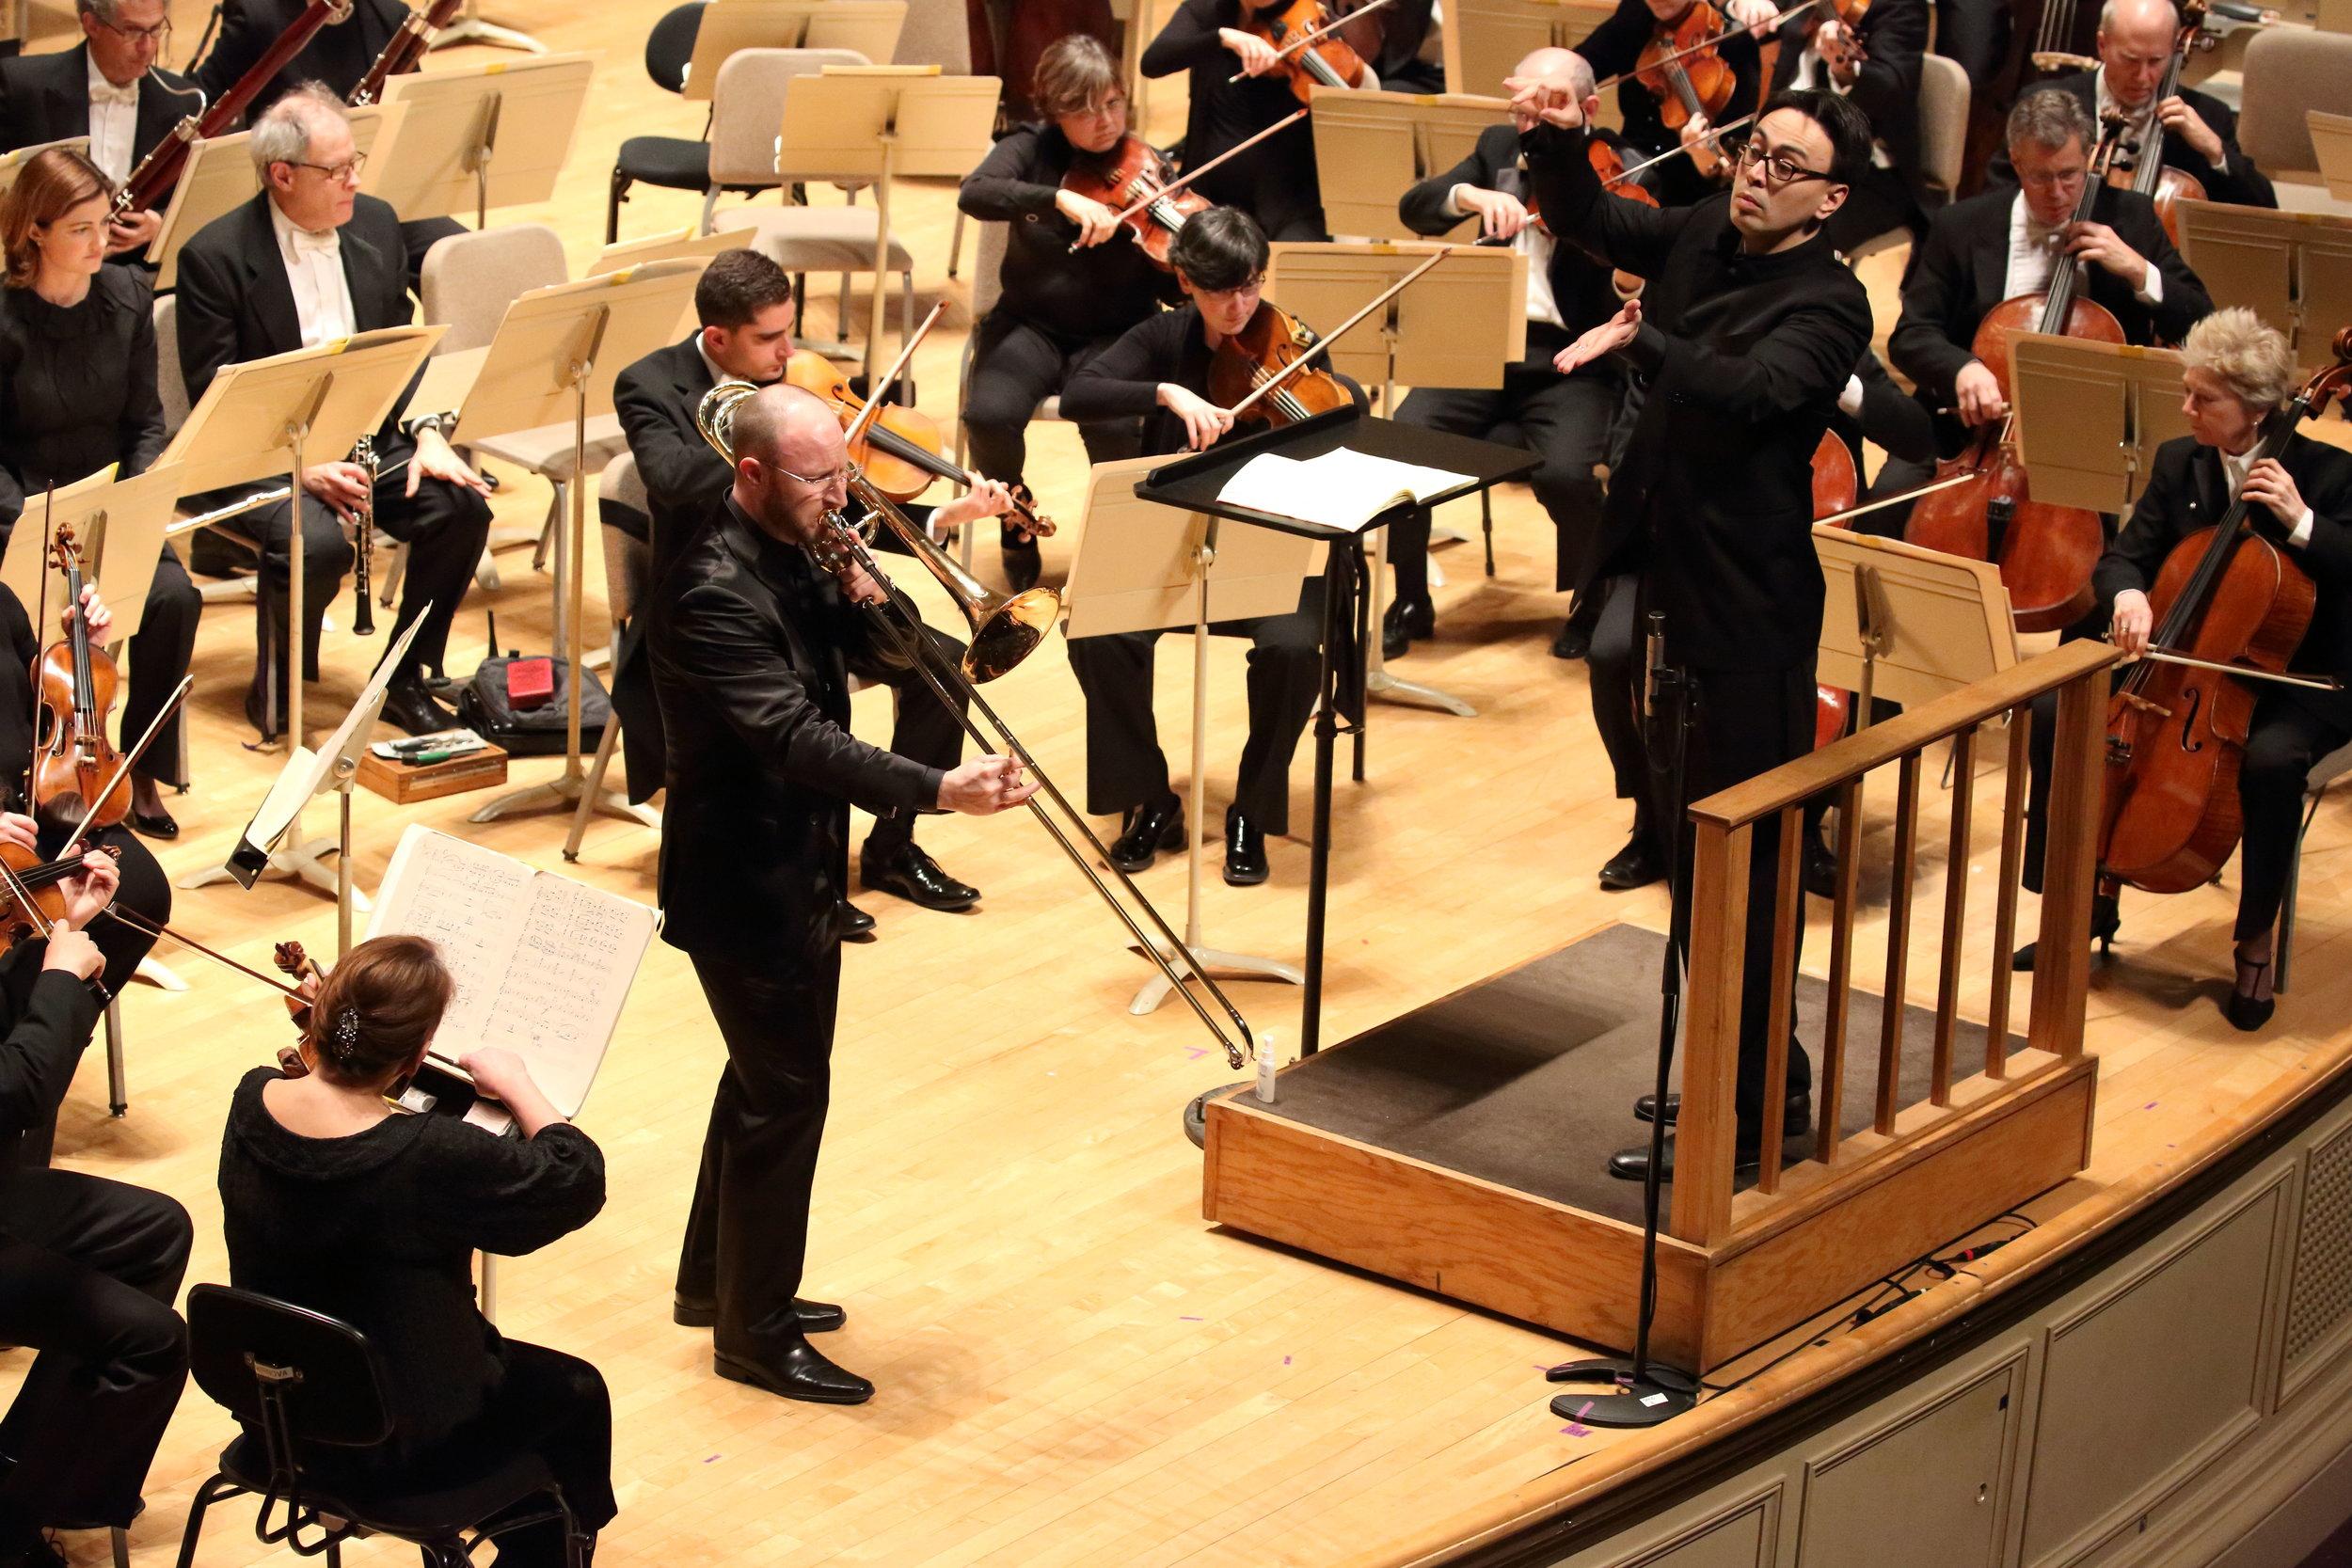 Boston Symphony Orchestra principal Toby Oft performs Nino Rota's Trombone Concerto with Ken-David Masur conducting, 5 January 2017. Hilary Scott photograph.